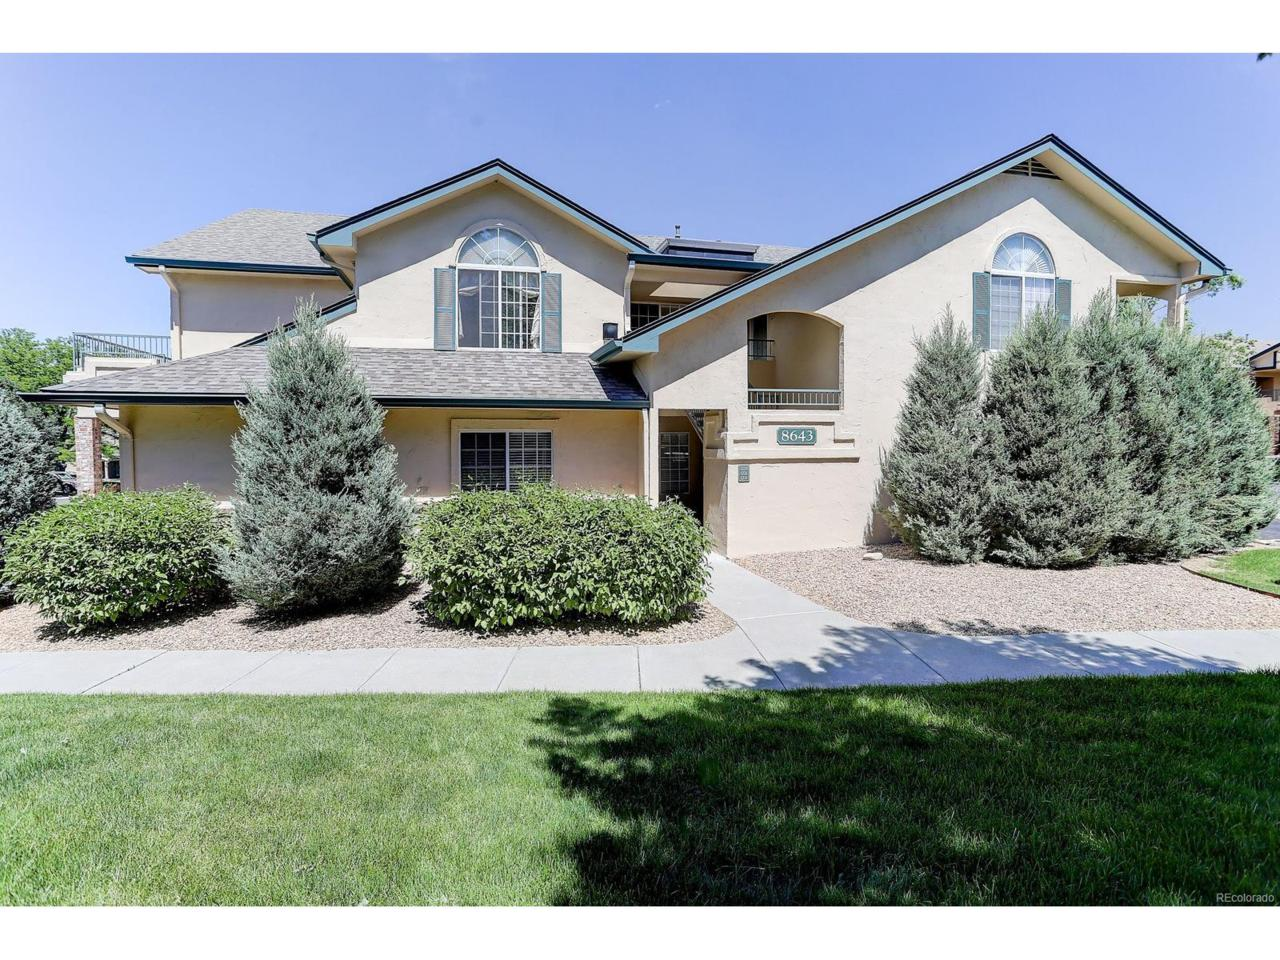 8643 E Dry Creek Road #1221, Centennial, CO 80112 (MLS #4423030) :: 8z Real Estate